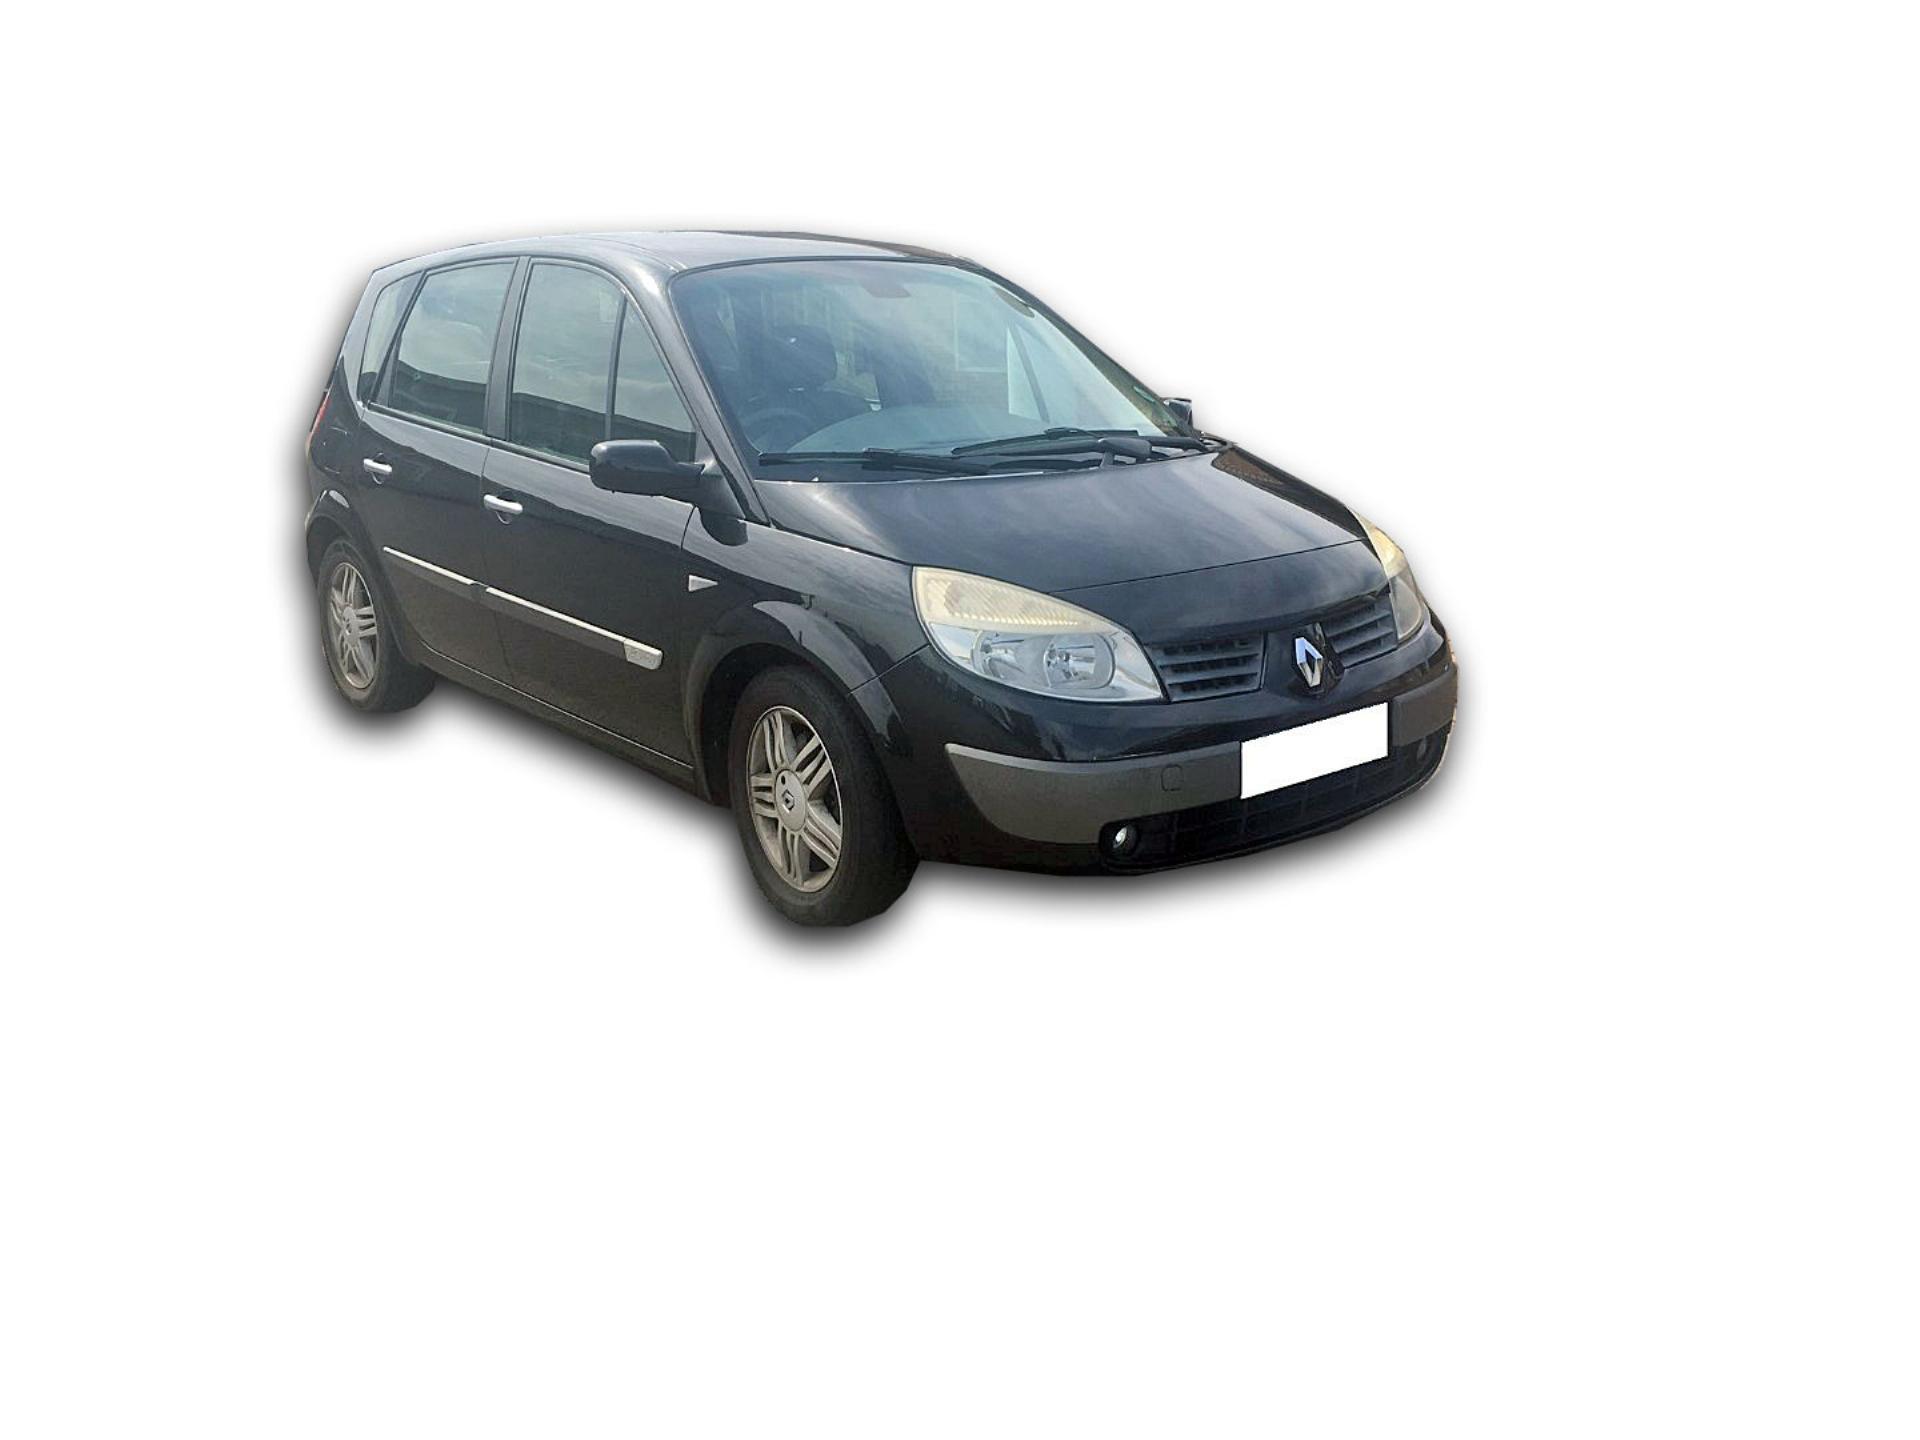 Renault Scenic 2.0 Dynamic